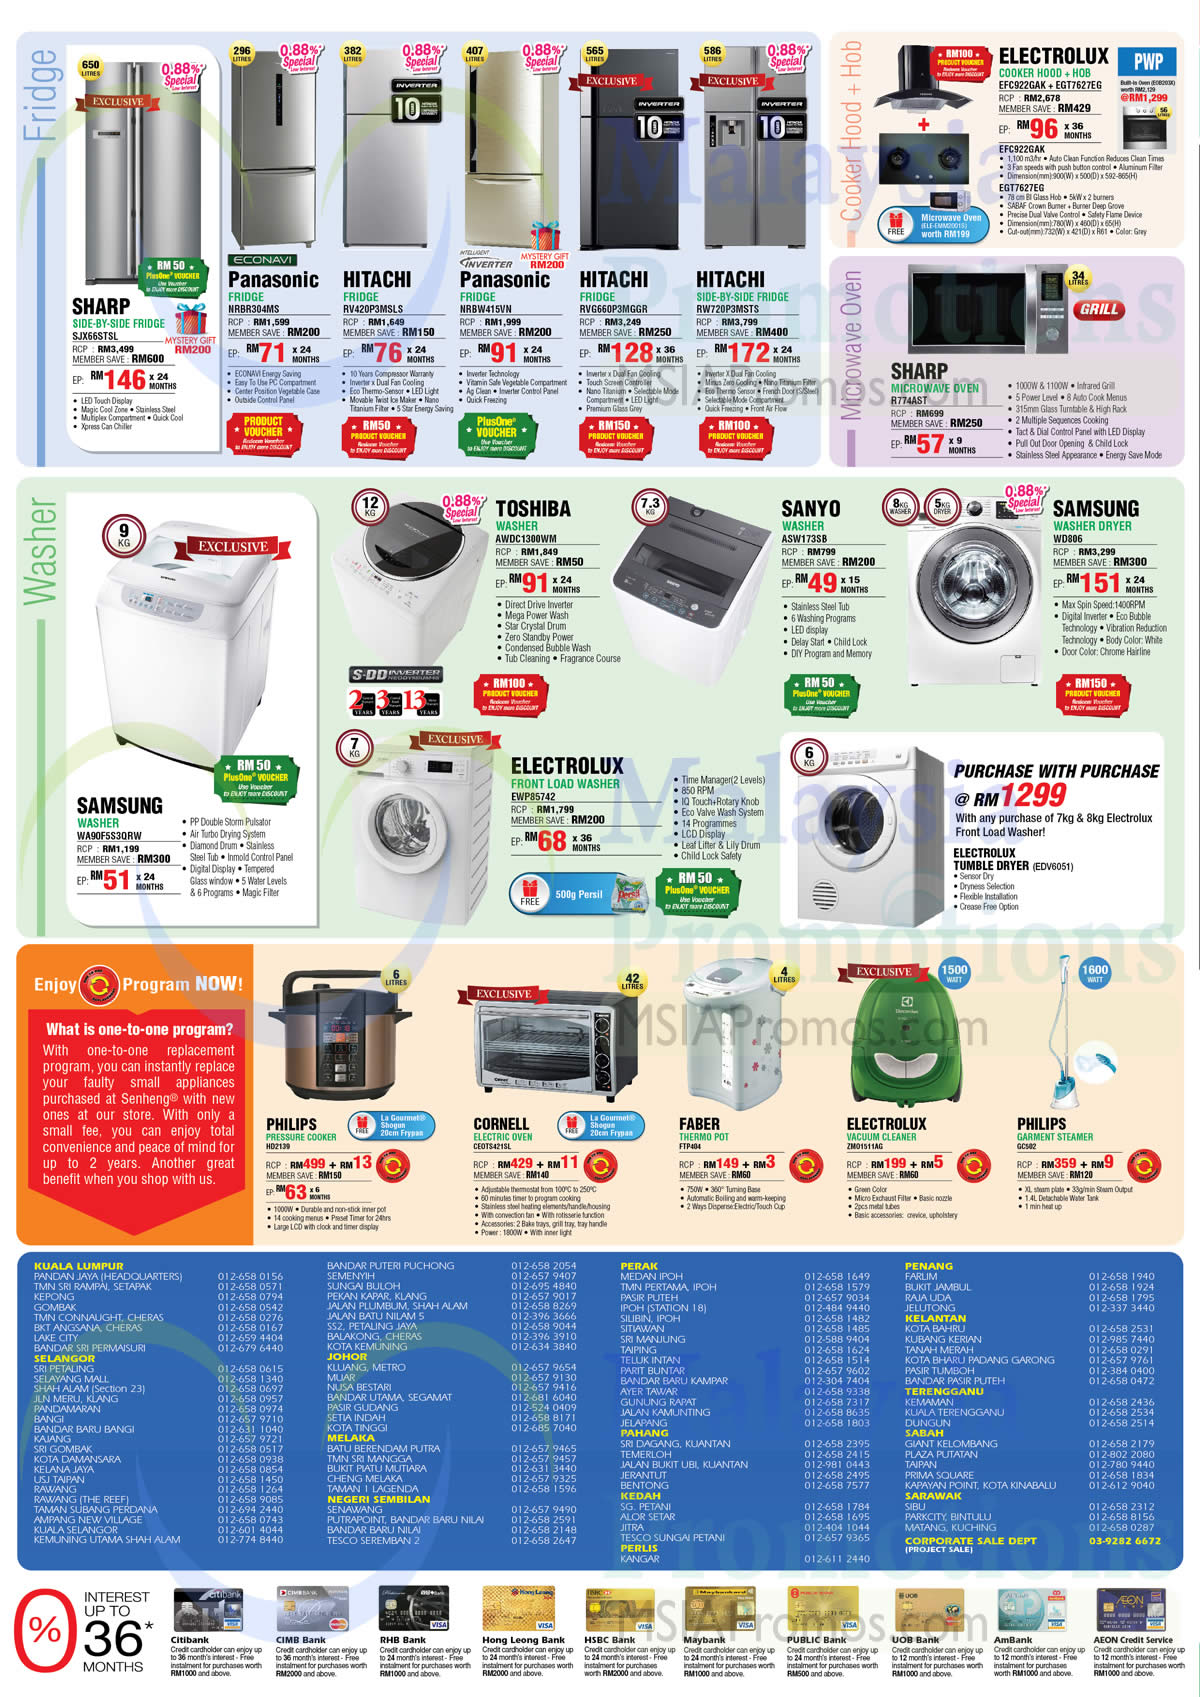 Uncategorized Sanyo Kitchen Appliances fridges washers kitchen appliances samsung toshiba sanyo cornell electrolux